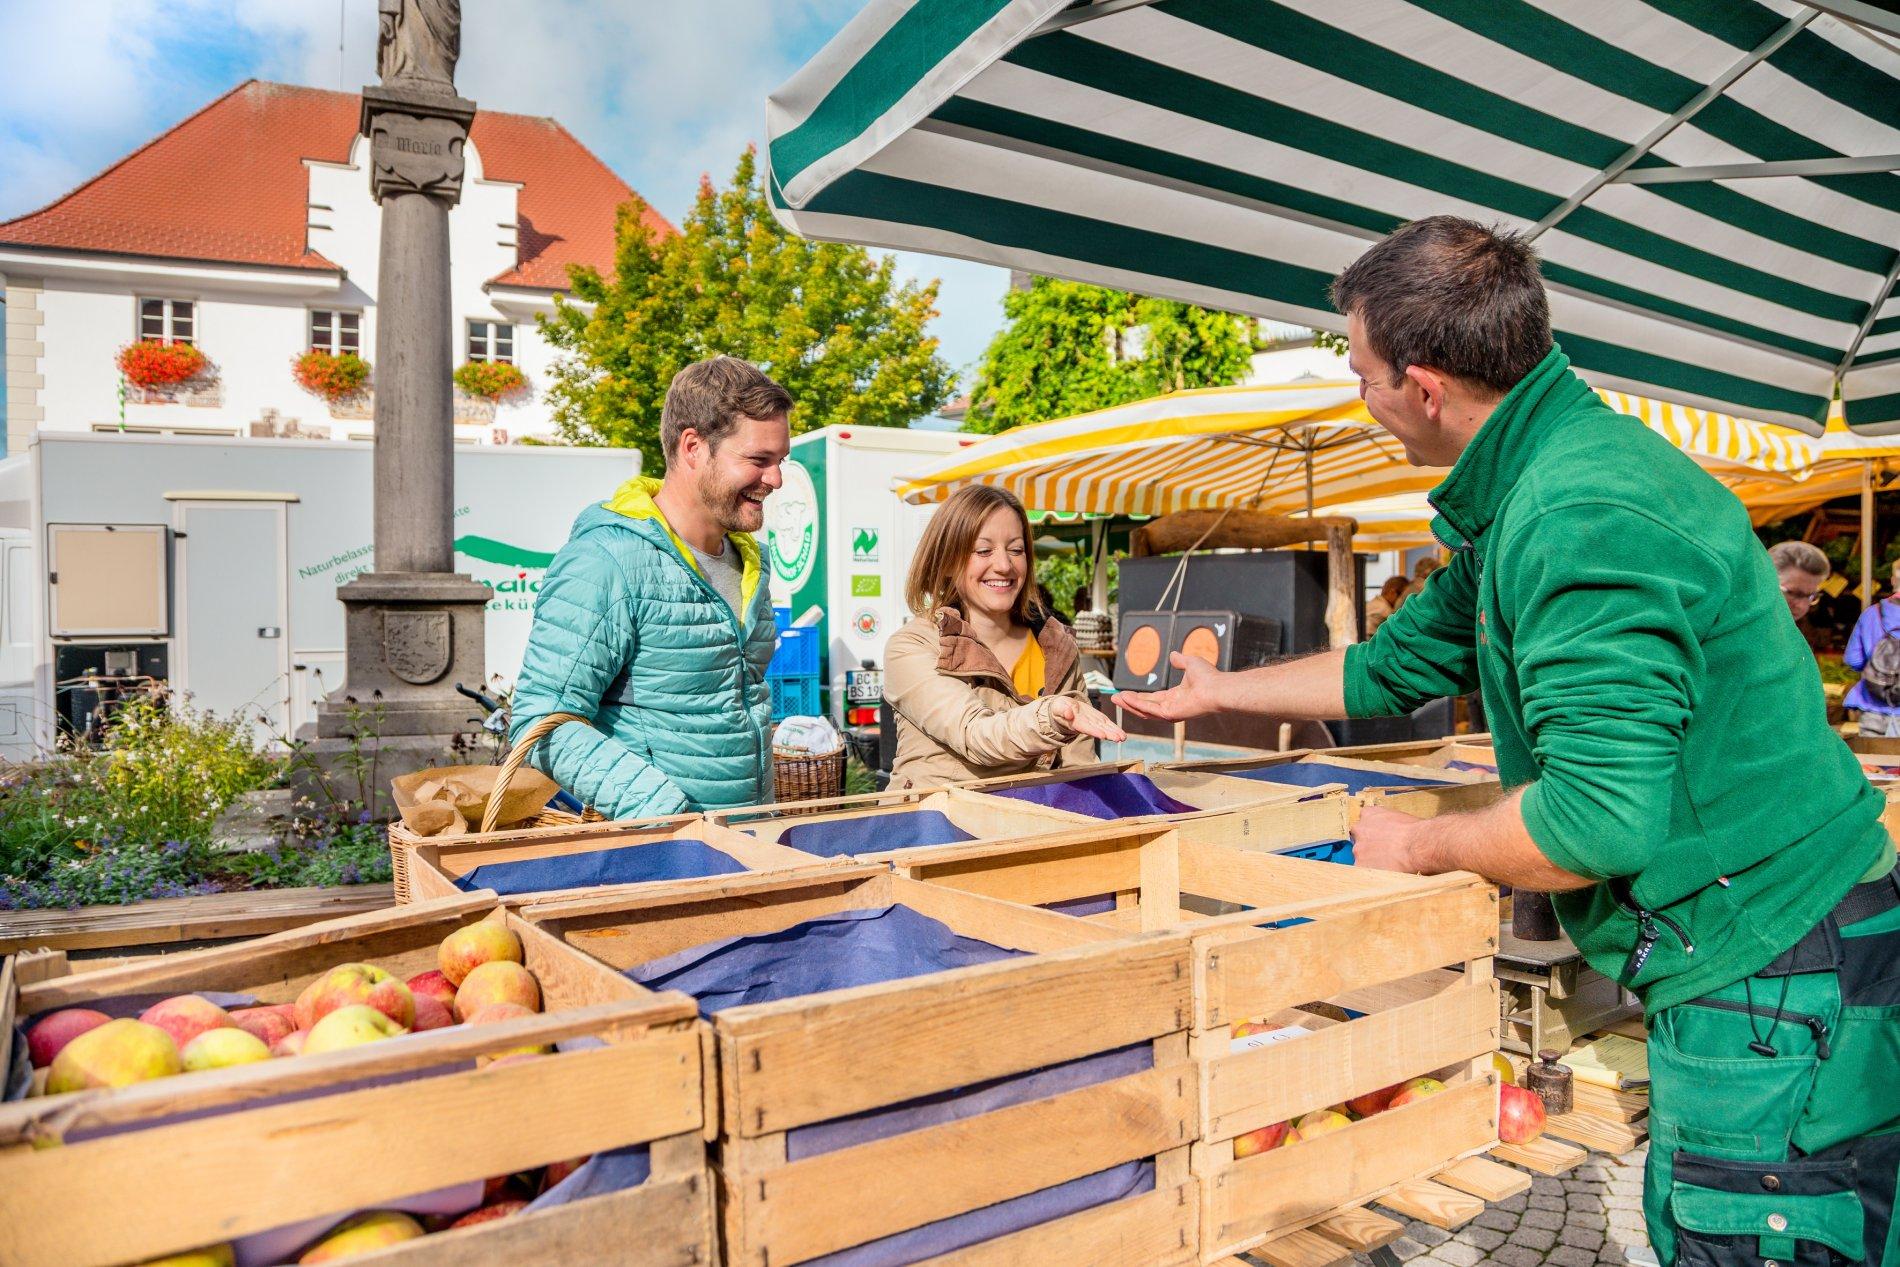 Wochenmarkt in Kißlegg